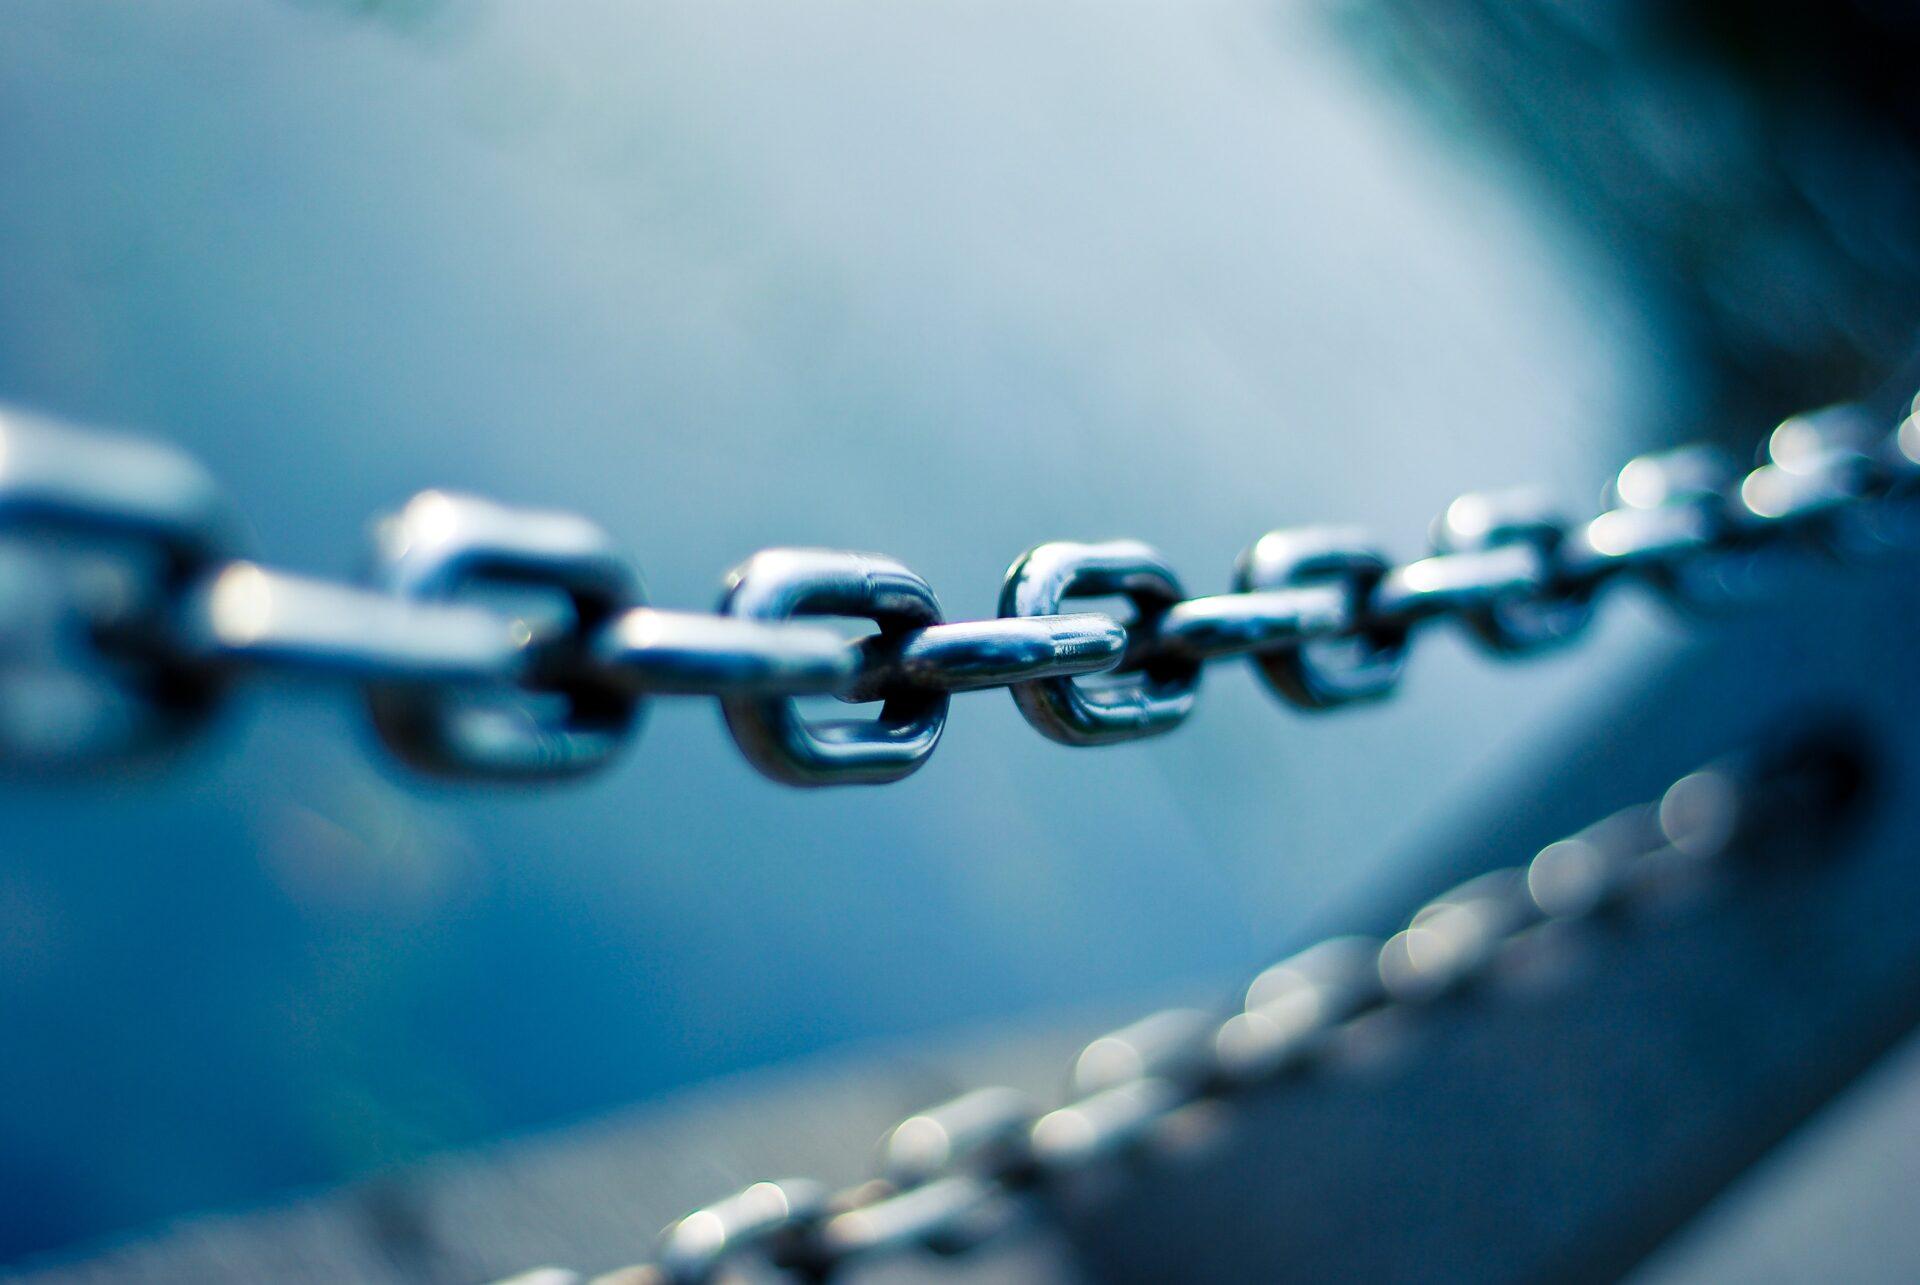 InnoEnergy Link Spurs Skeleton Growth - Batteries Featured Graphene